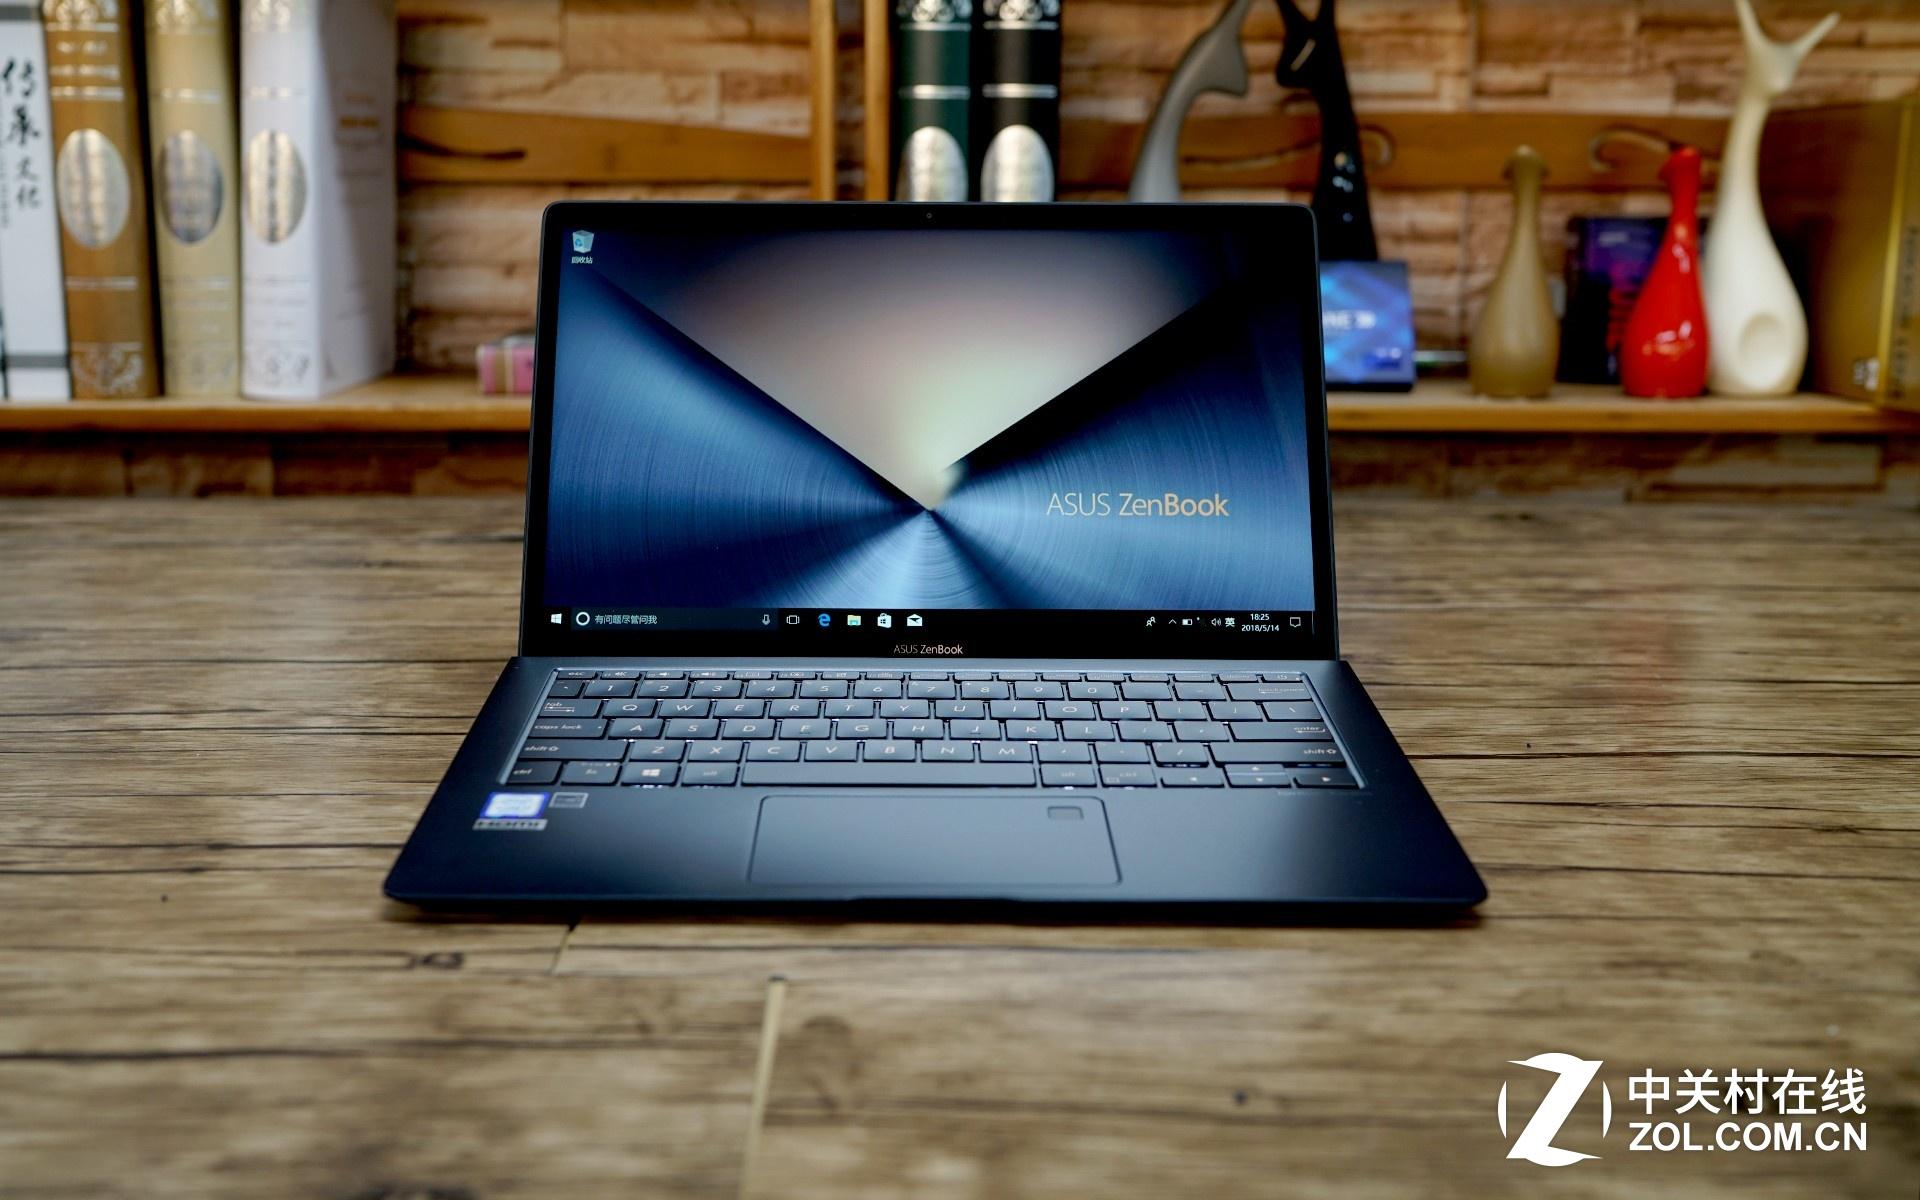 ASUS ZenBook S UX391UA Review - Laptopmain com